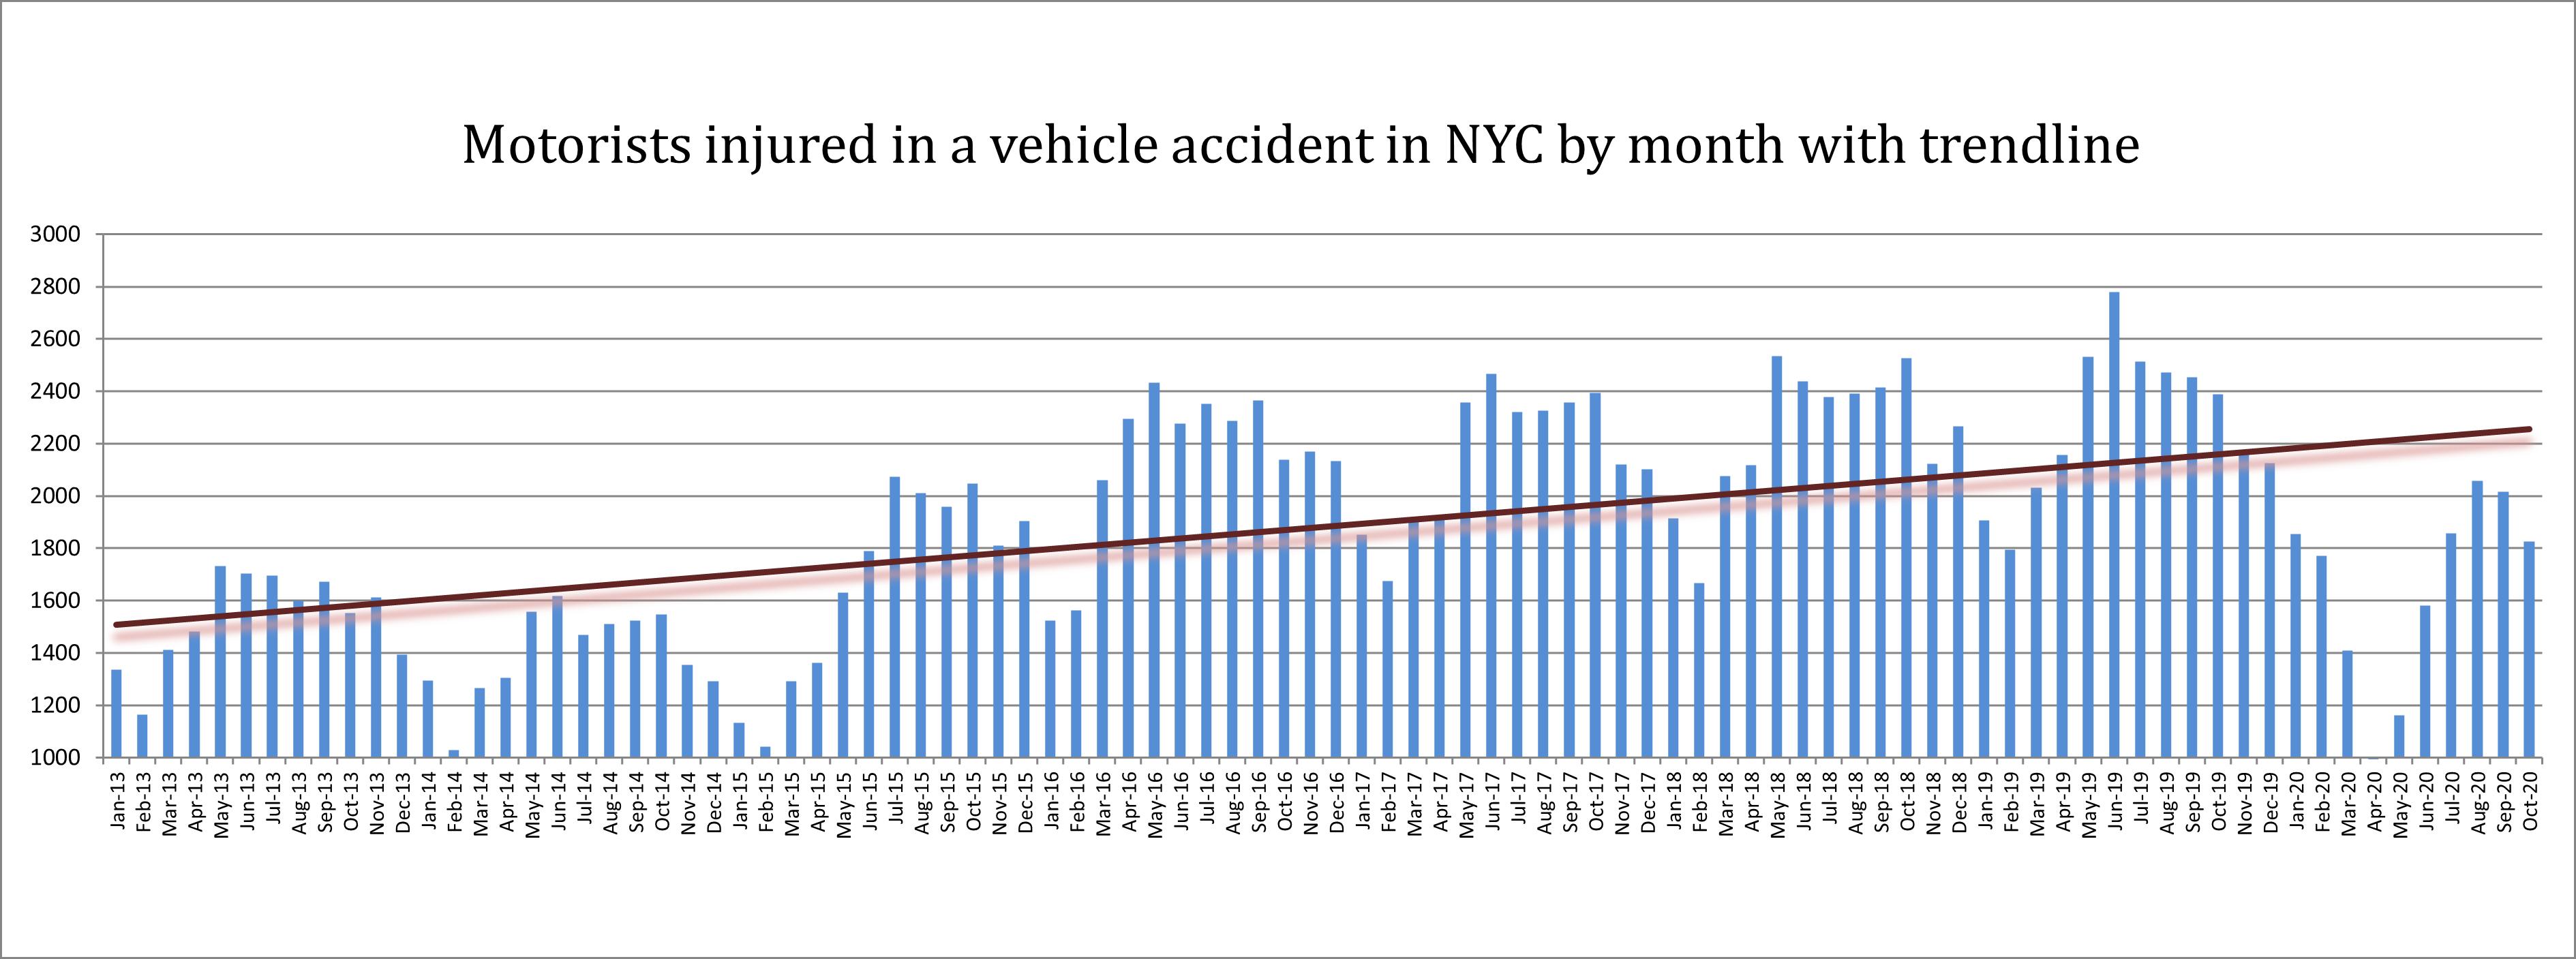 Motorist injuries in New York in October 2020